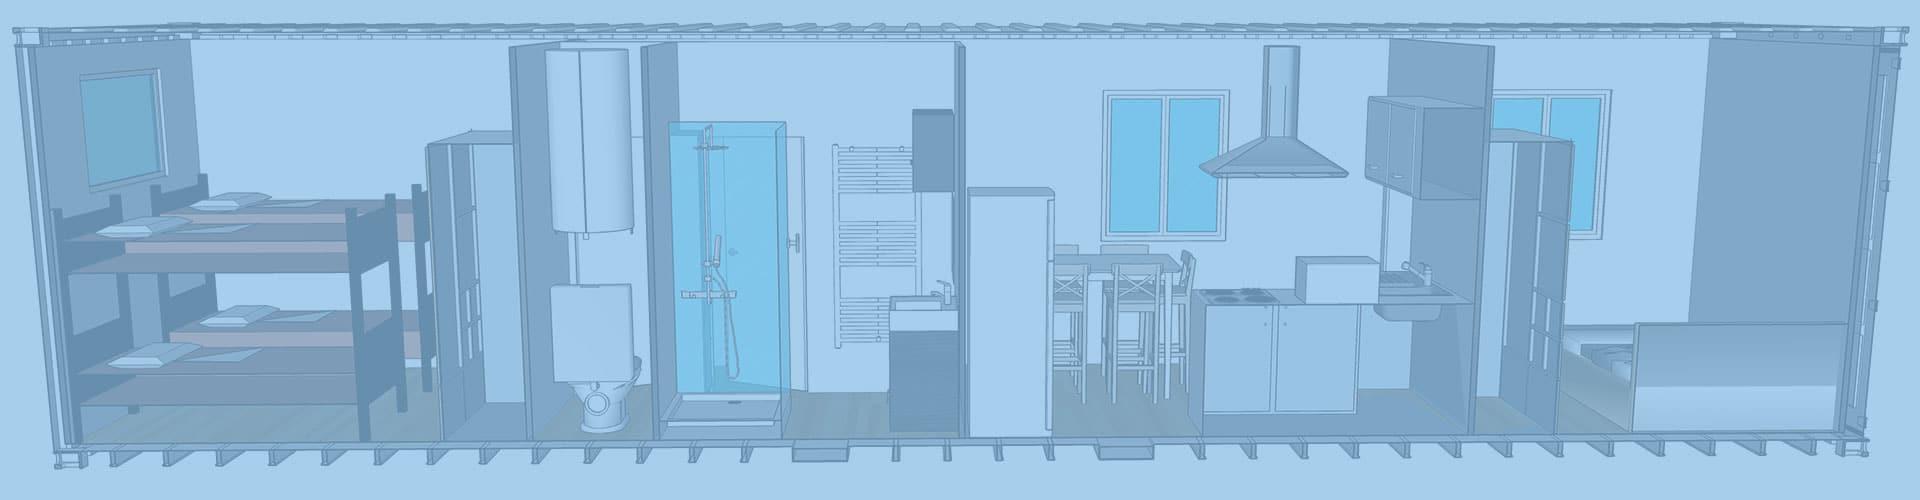 containers transform s en logements container studio container maison. Black Bedroom Furniture Sets. Home Design Ideas